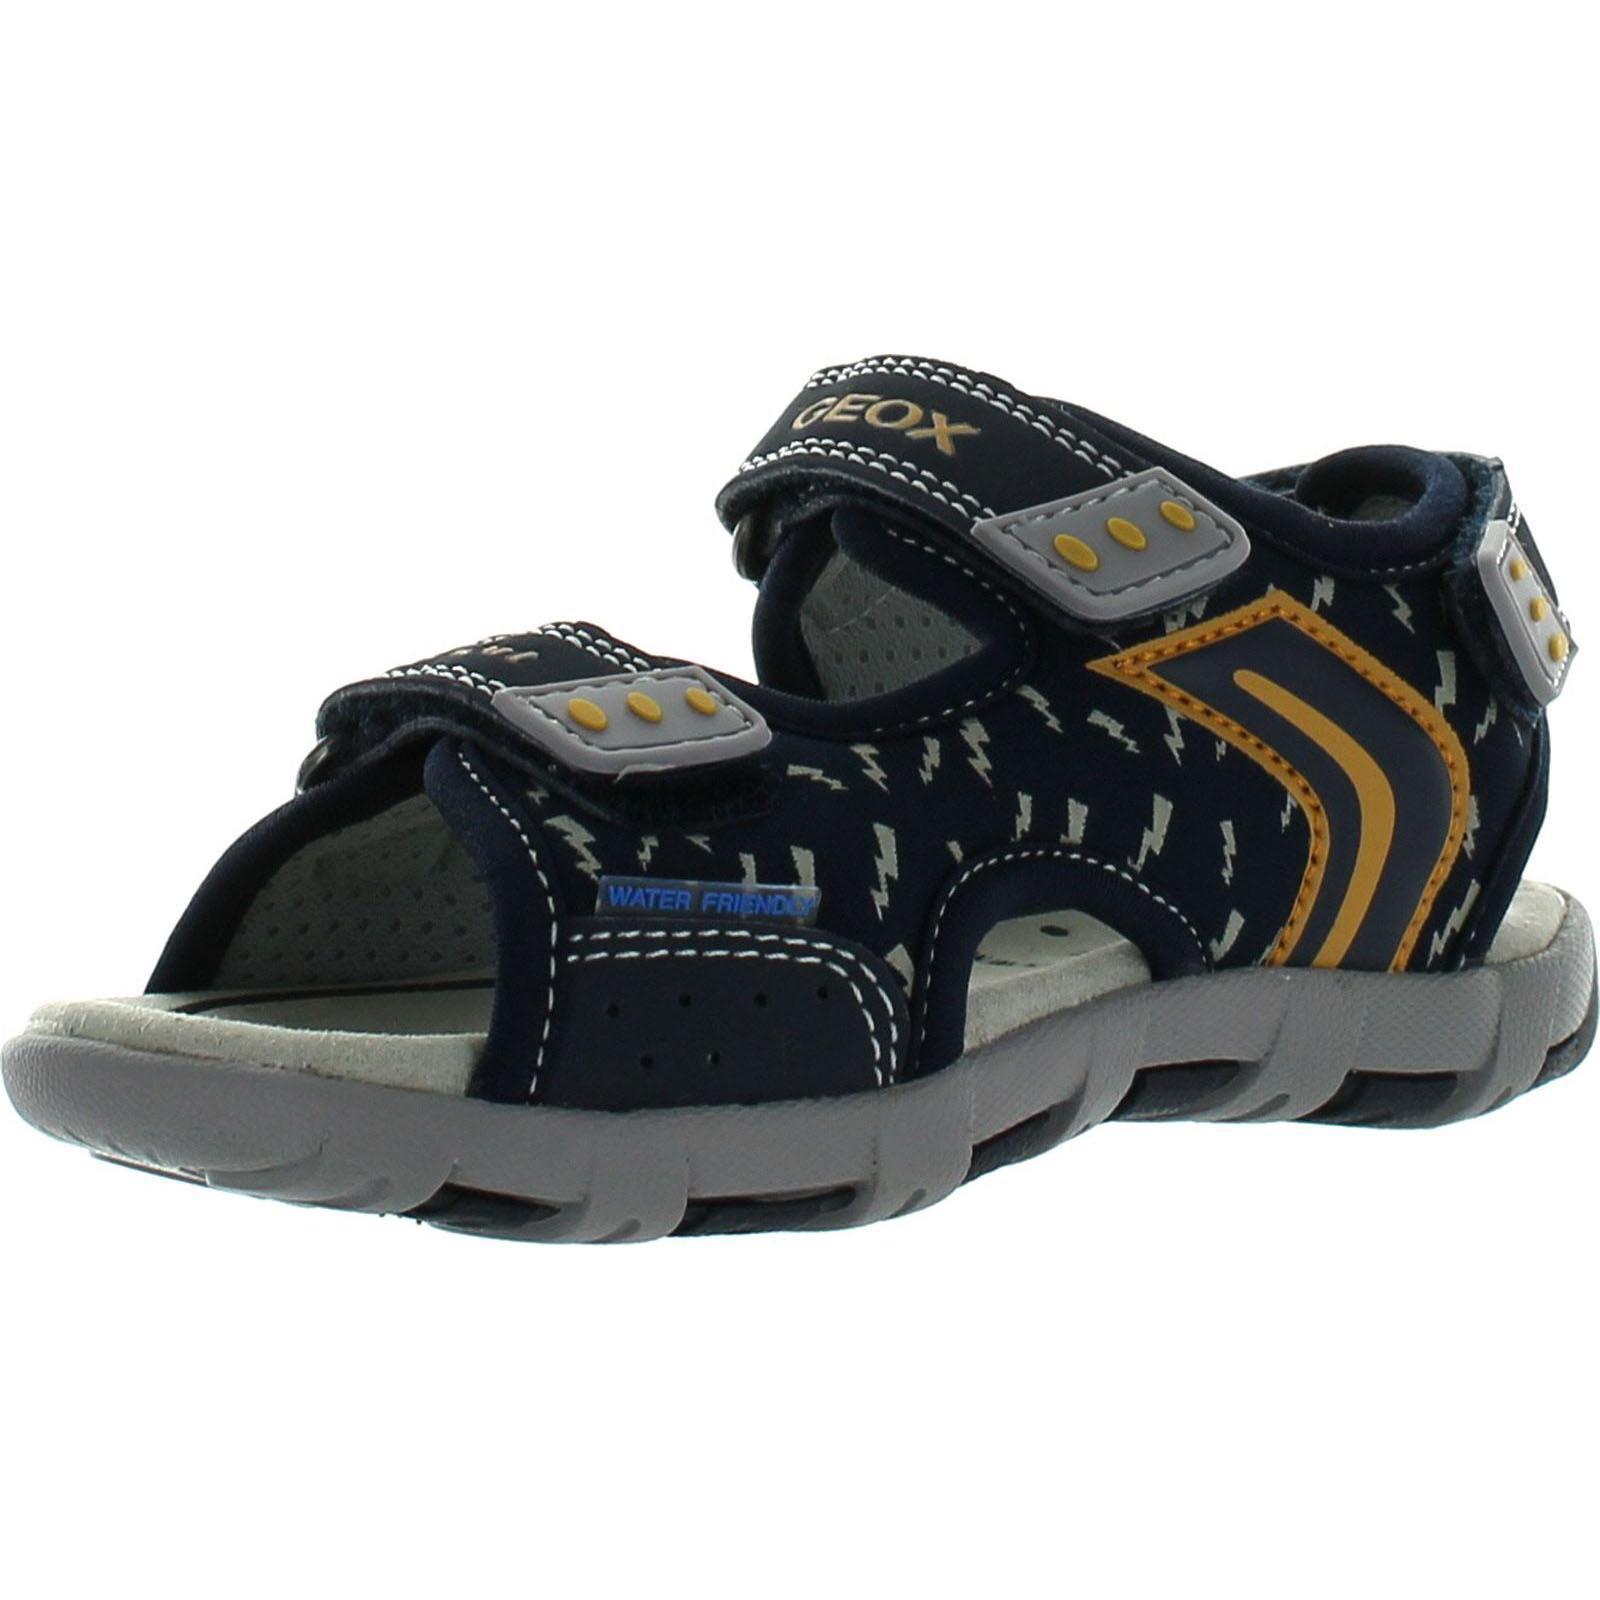 19167346f Geox Boys Kids Sand.Pianeta D Water Friendly Outdoor Fashion Sandals ...